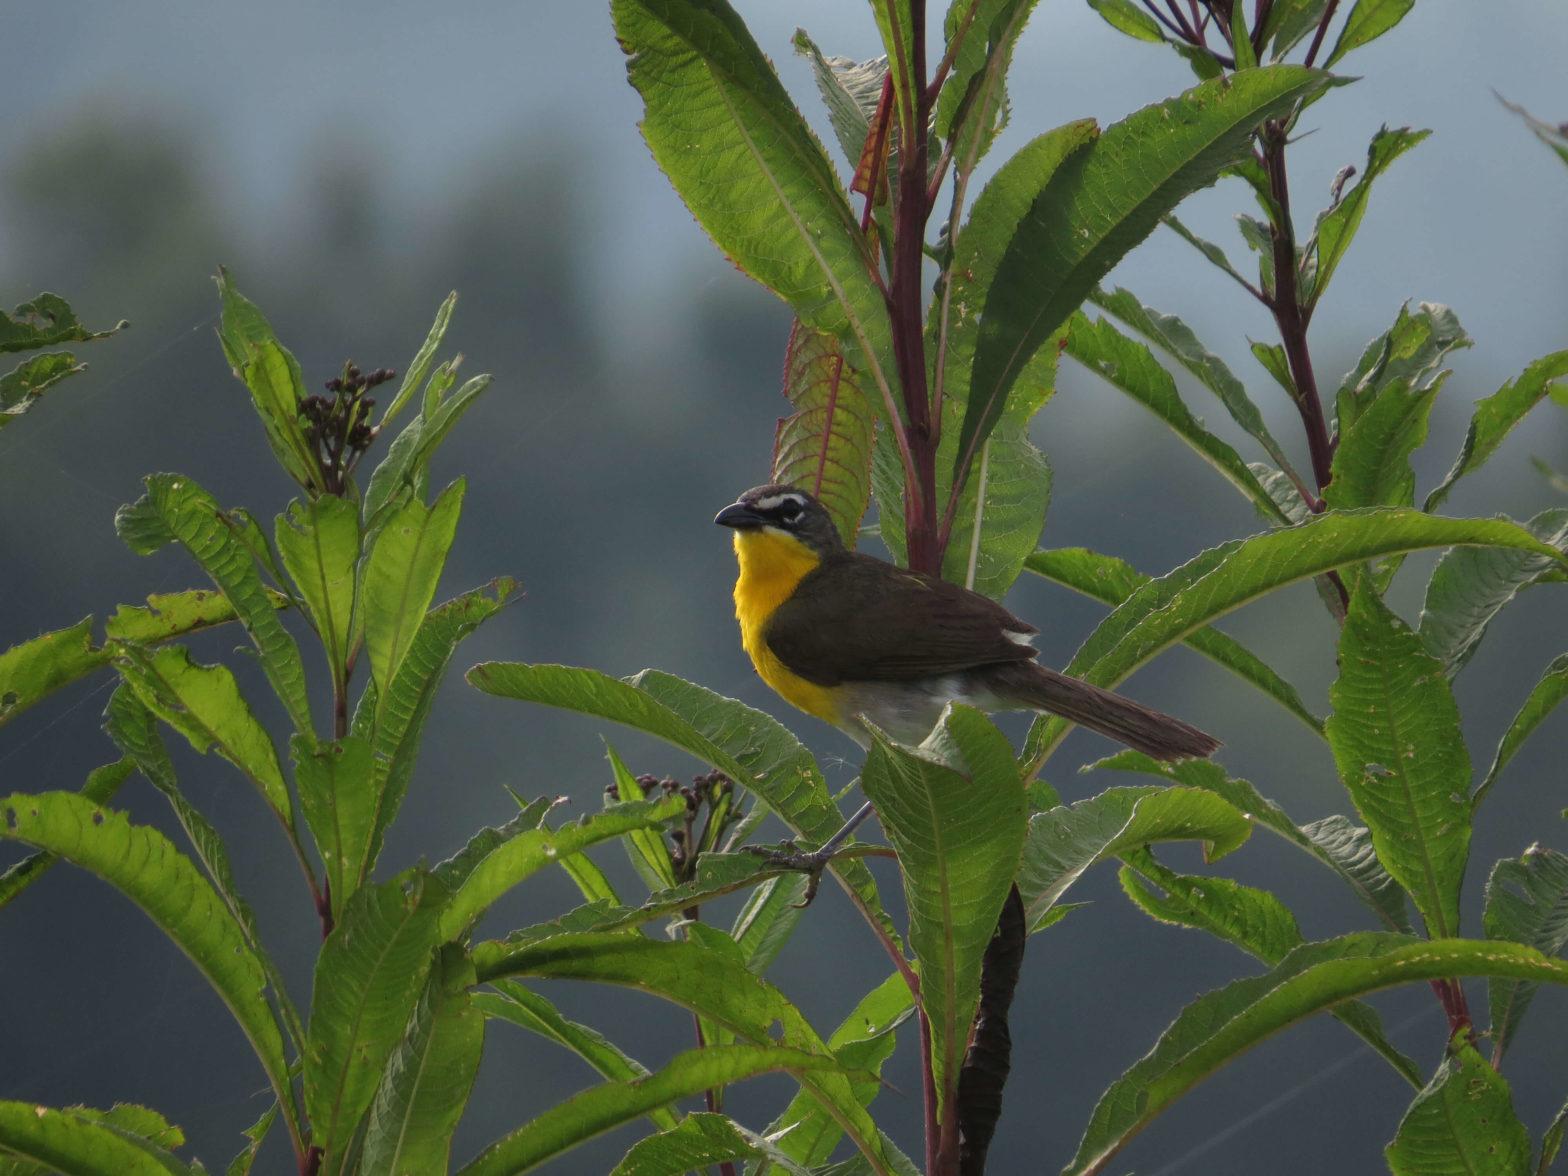 Bird in Foliage